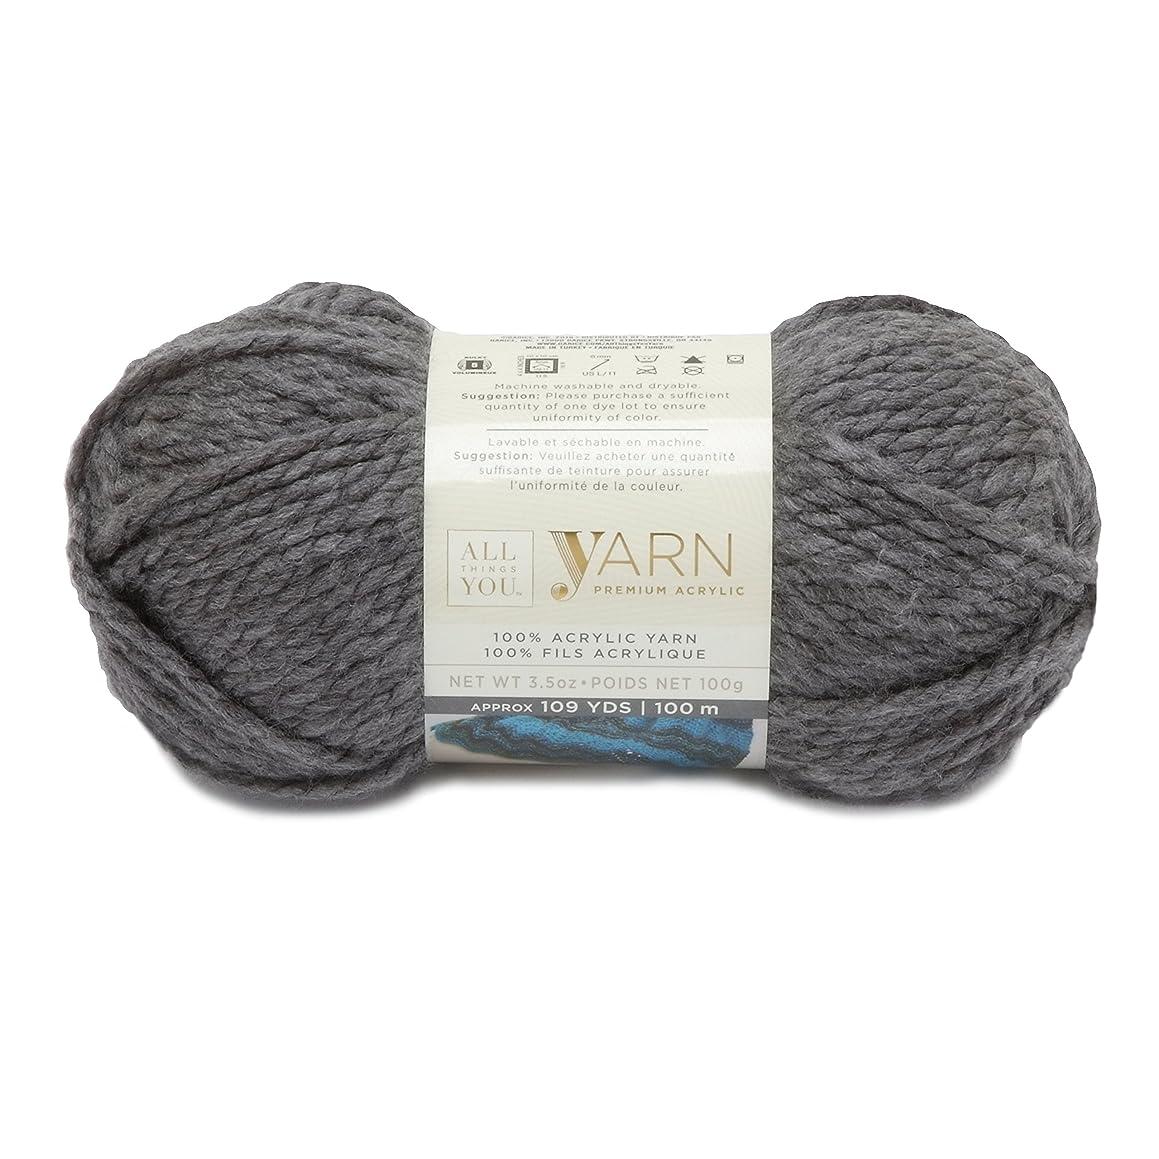 Darice All Things You, Premium Acylic Yarn, Charcoal